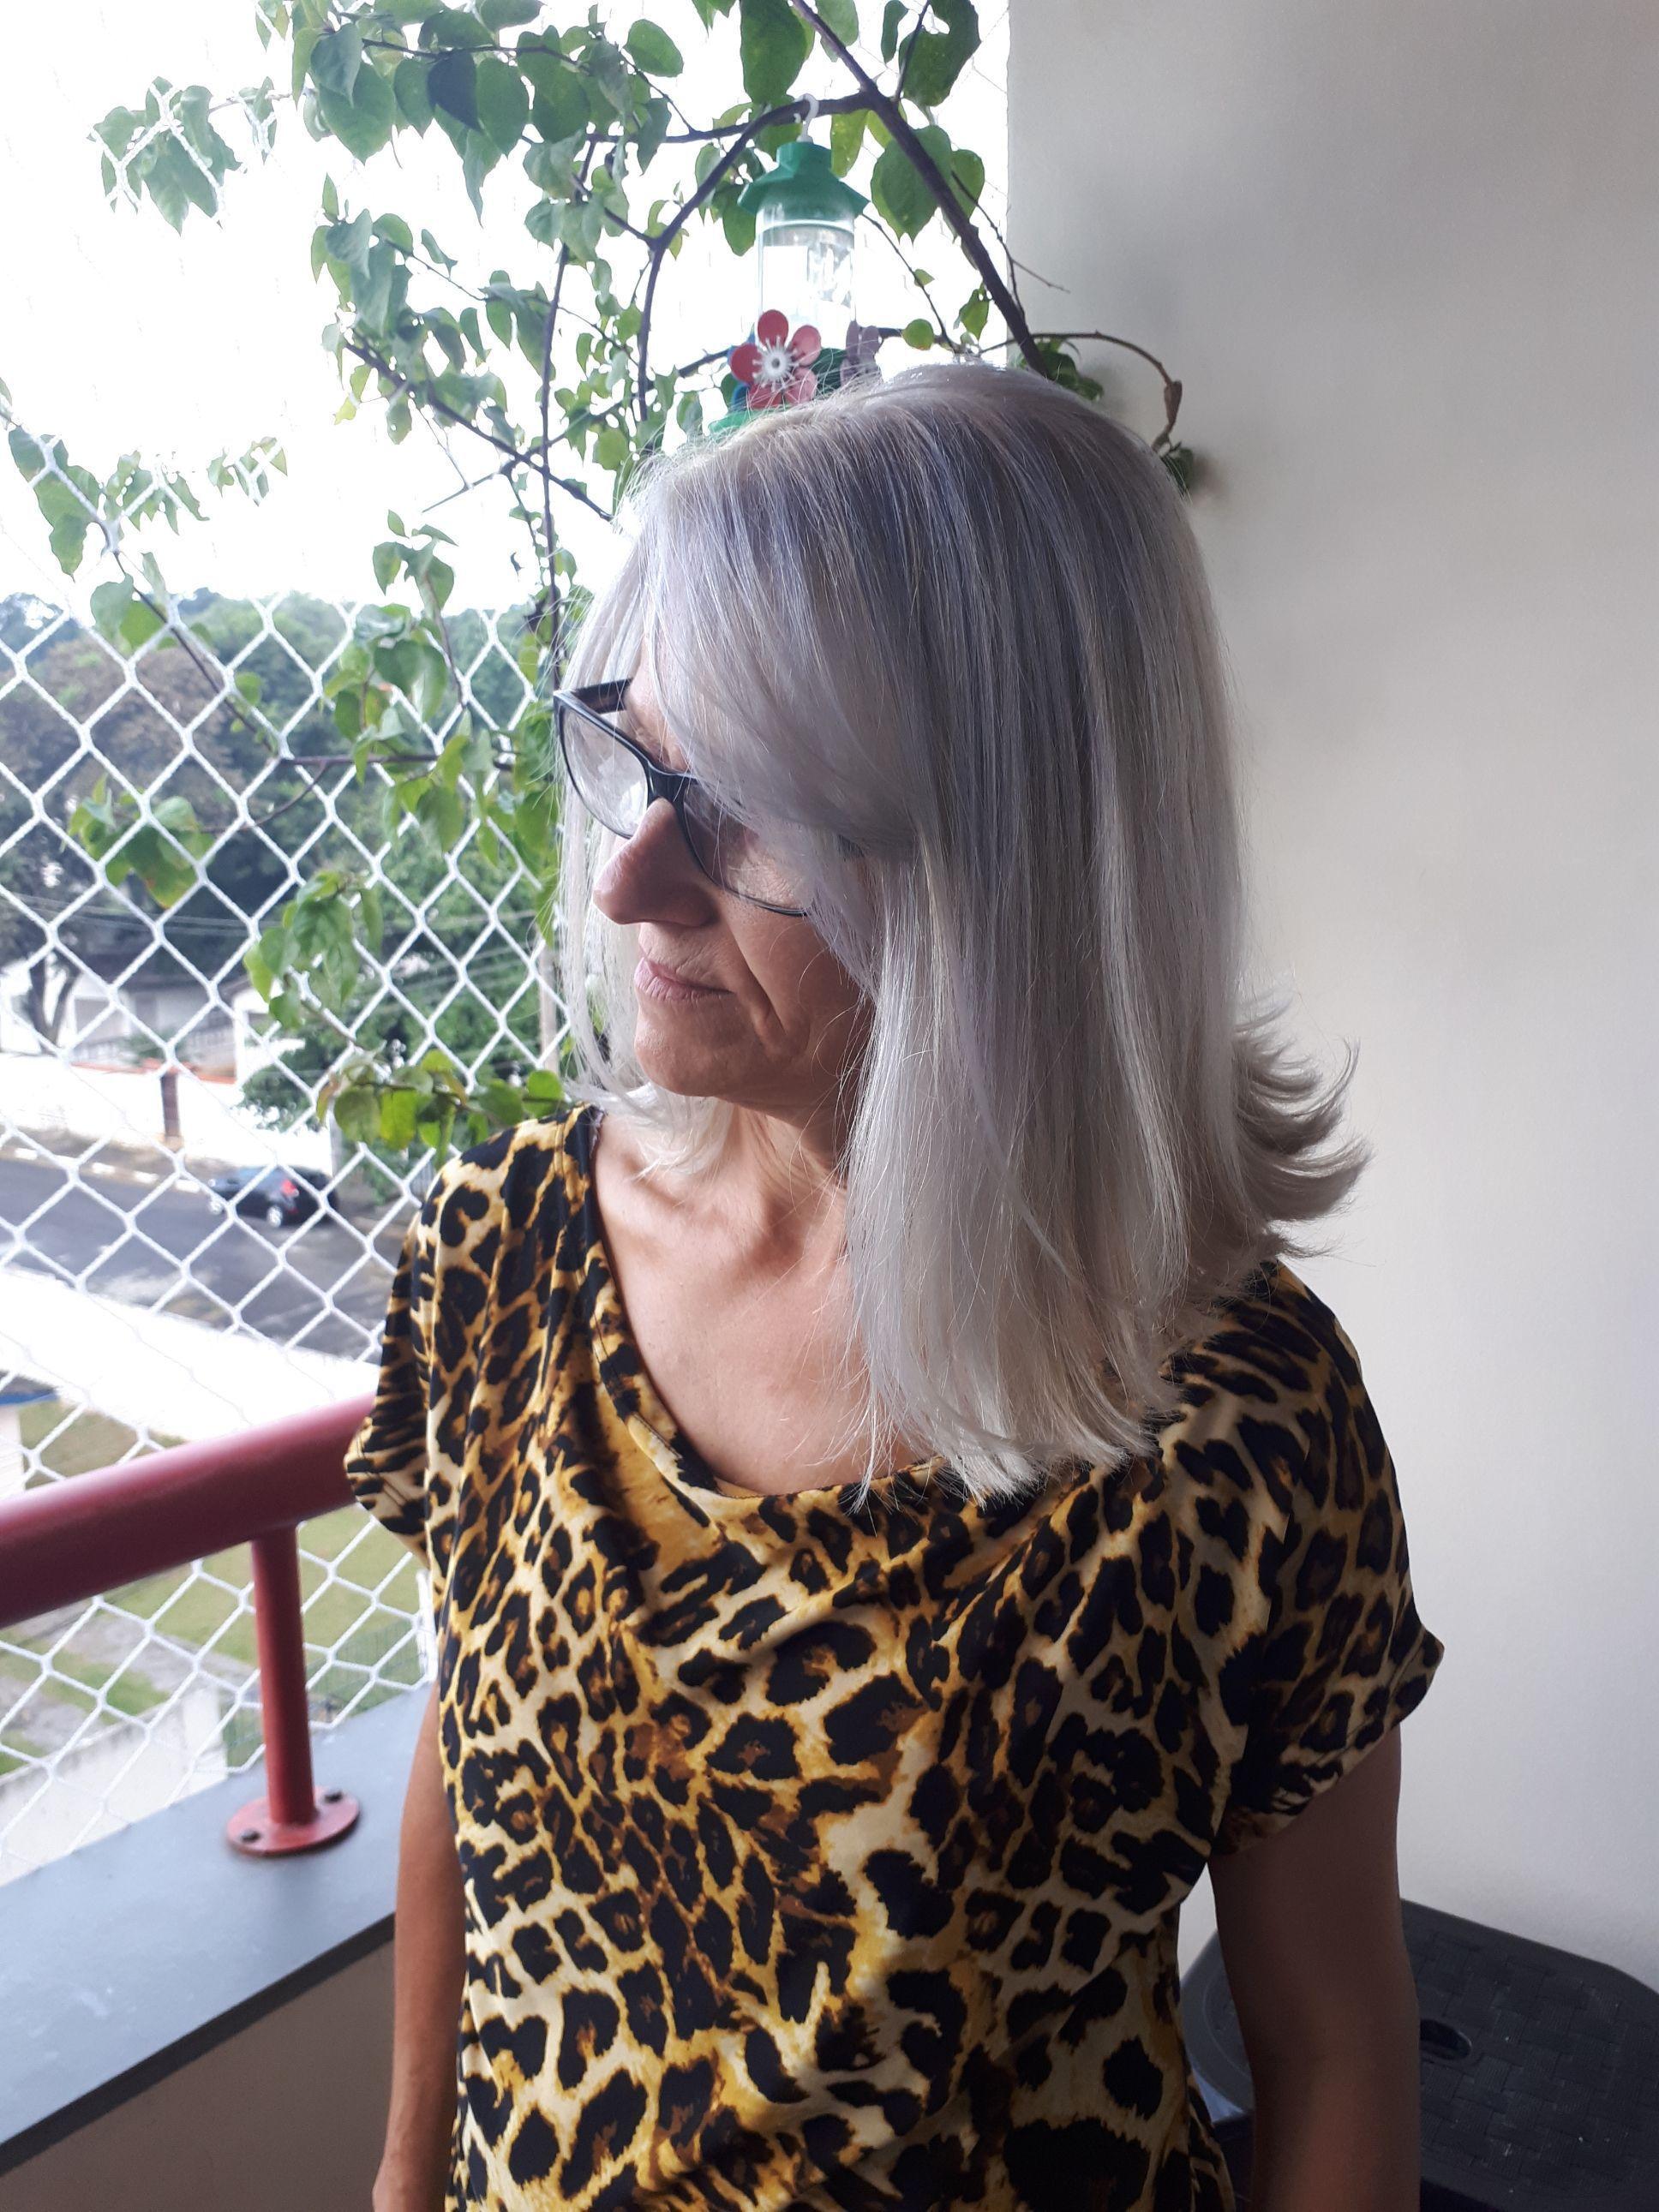 Luzes e corte. cabelo cabeleireiro(a)